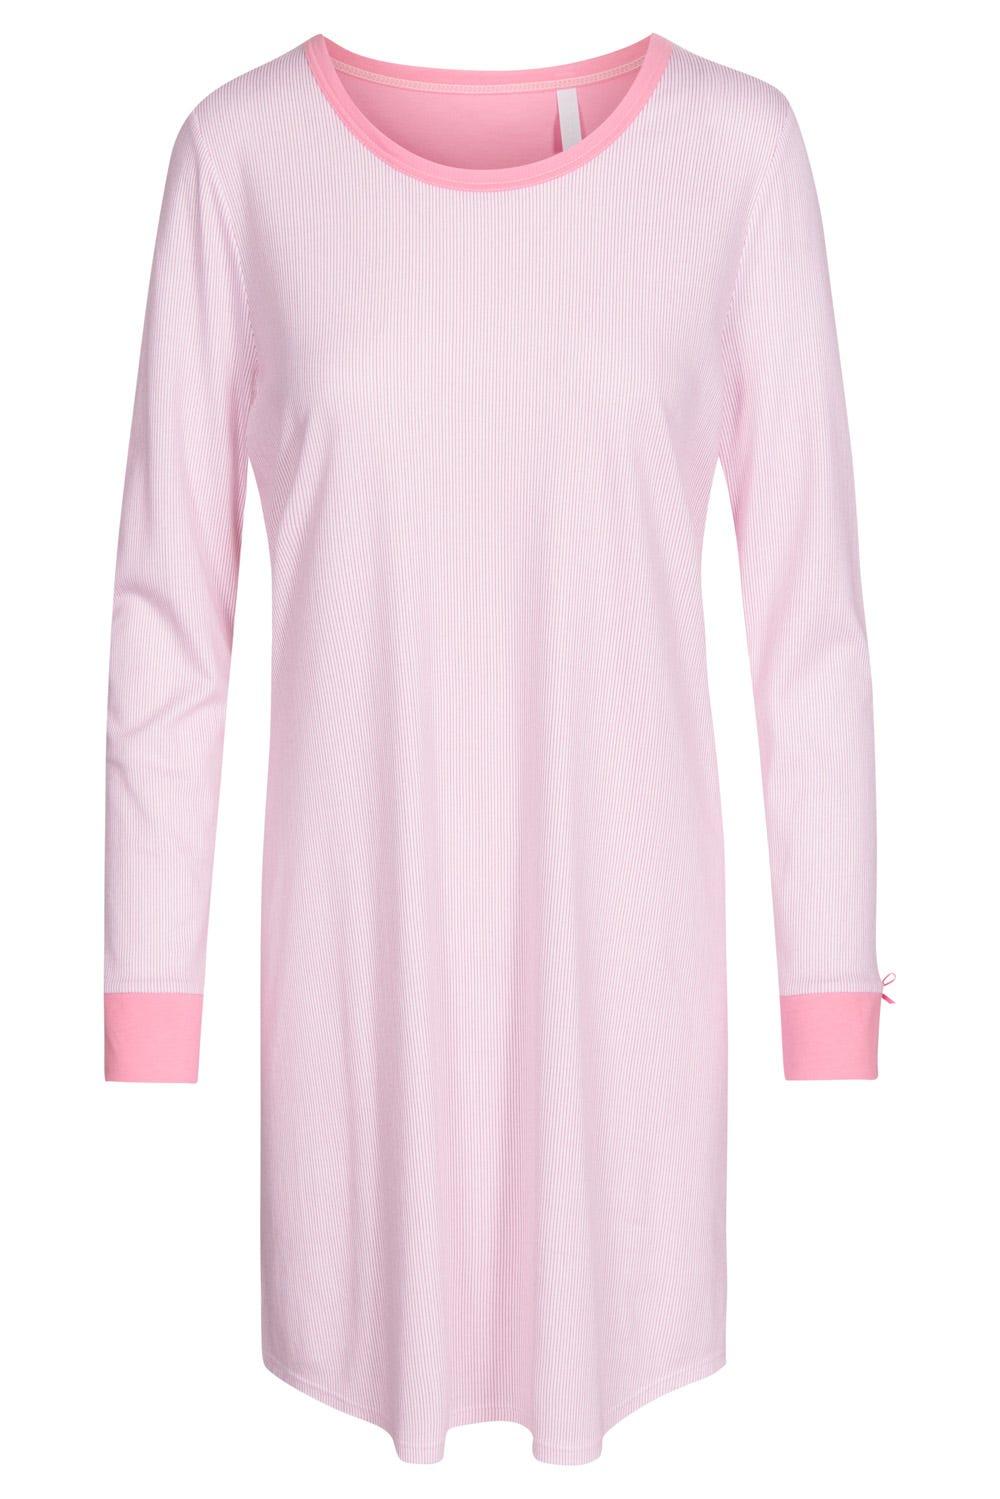 Basic Bigshirt mit Ärmelbündchenc1652242